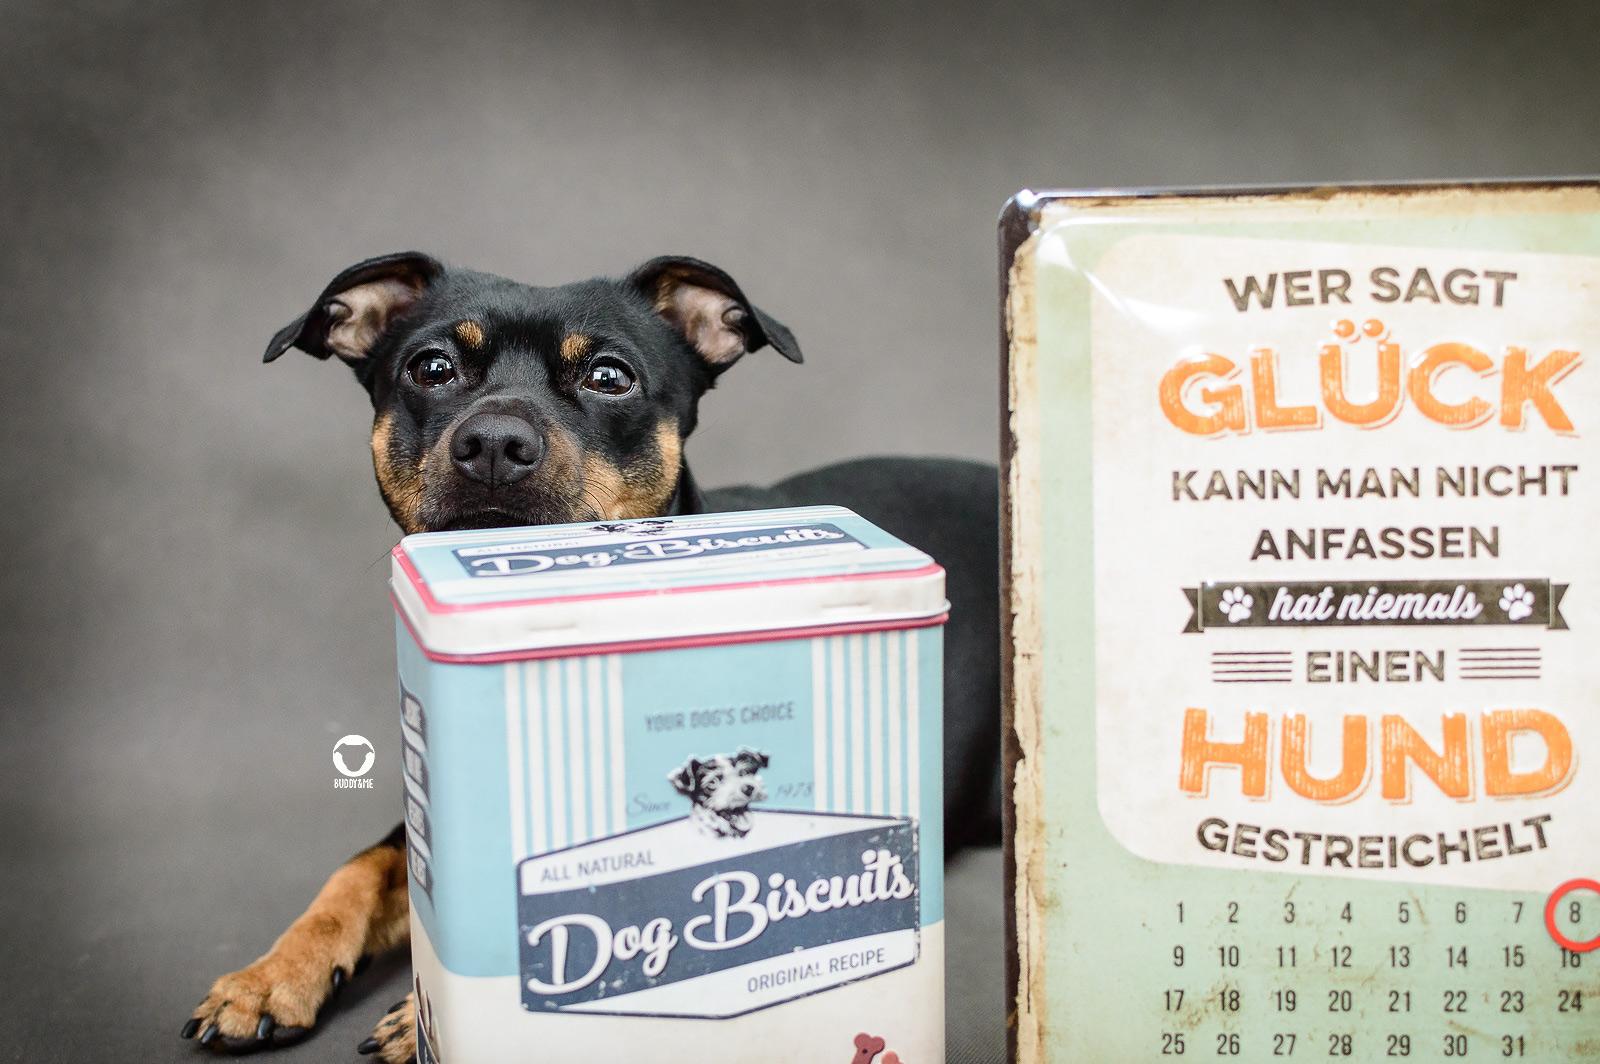 Pinscher Buddy, Buddy and Me, Hundeblog, Dogblog, Kooperation, Produkttest, Erfahrungen, Pfotenschild, Nostalgic Art, Deko, Hundehaushalt, Hundeliebhaber, Retrodesign, Shabby Chic, Blechschilder, Blechdosen, Leckerlidosen, Hundekeksdosen, Kalender, Schlüsselanhänger, nostalgisch, Hundetasse, Hundeliebe, Geschenkidee, Dekoration, Zuhause